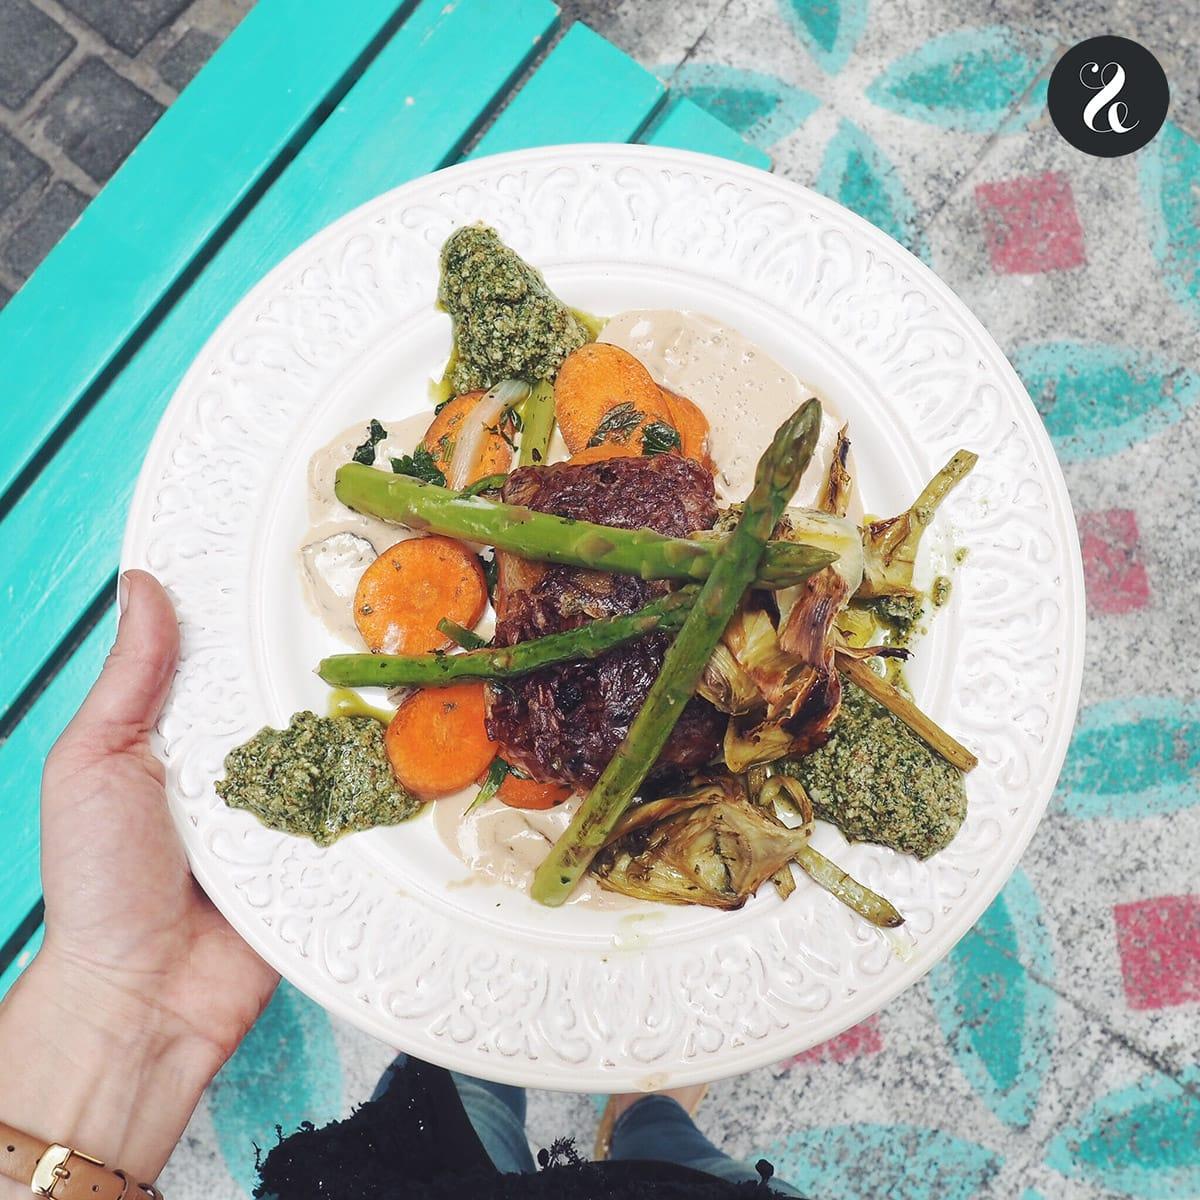 Mejores restaurantes sanos Madrid - Rayén Vegano